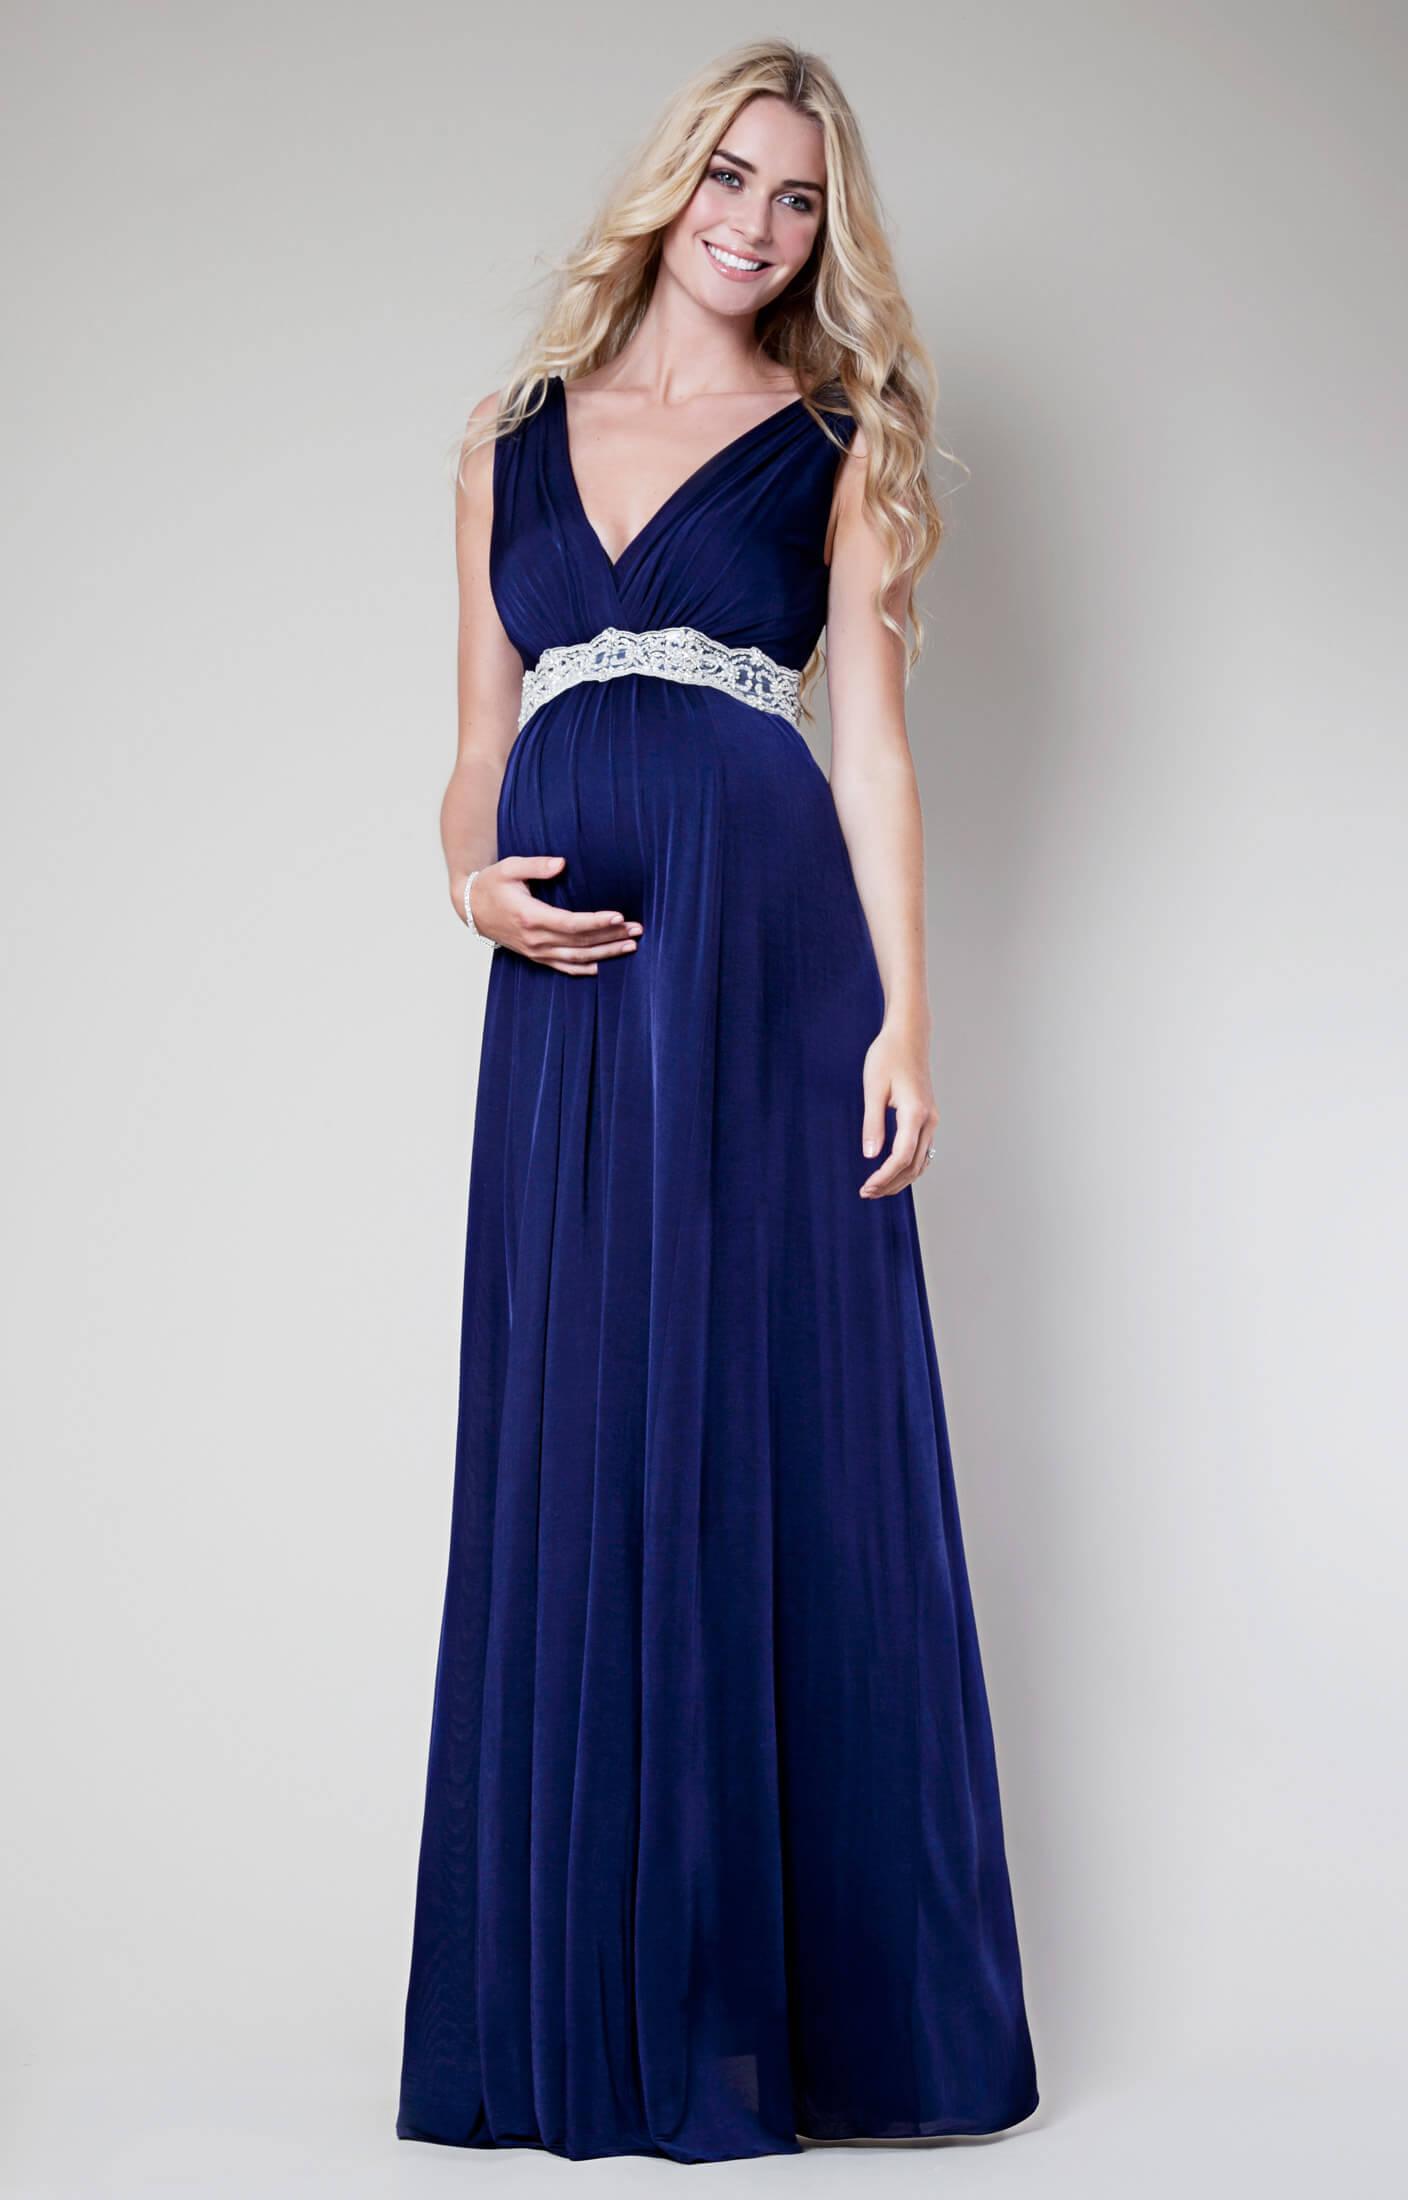 Tall Maternity Clothing